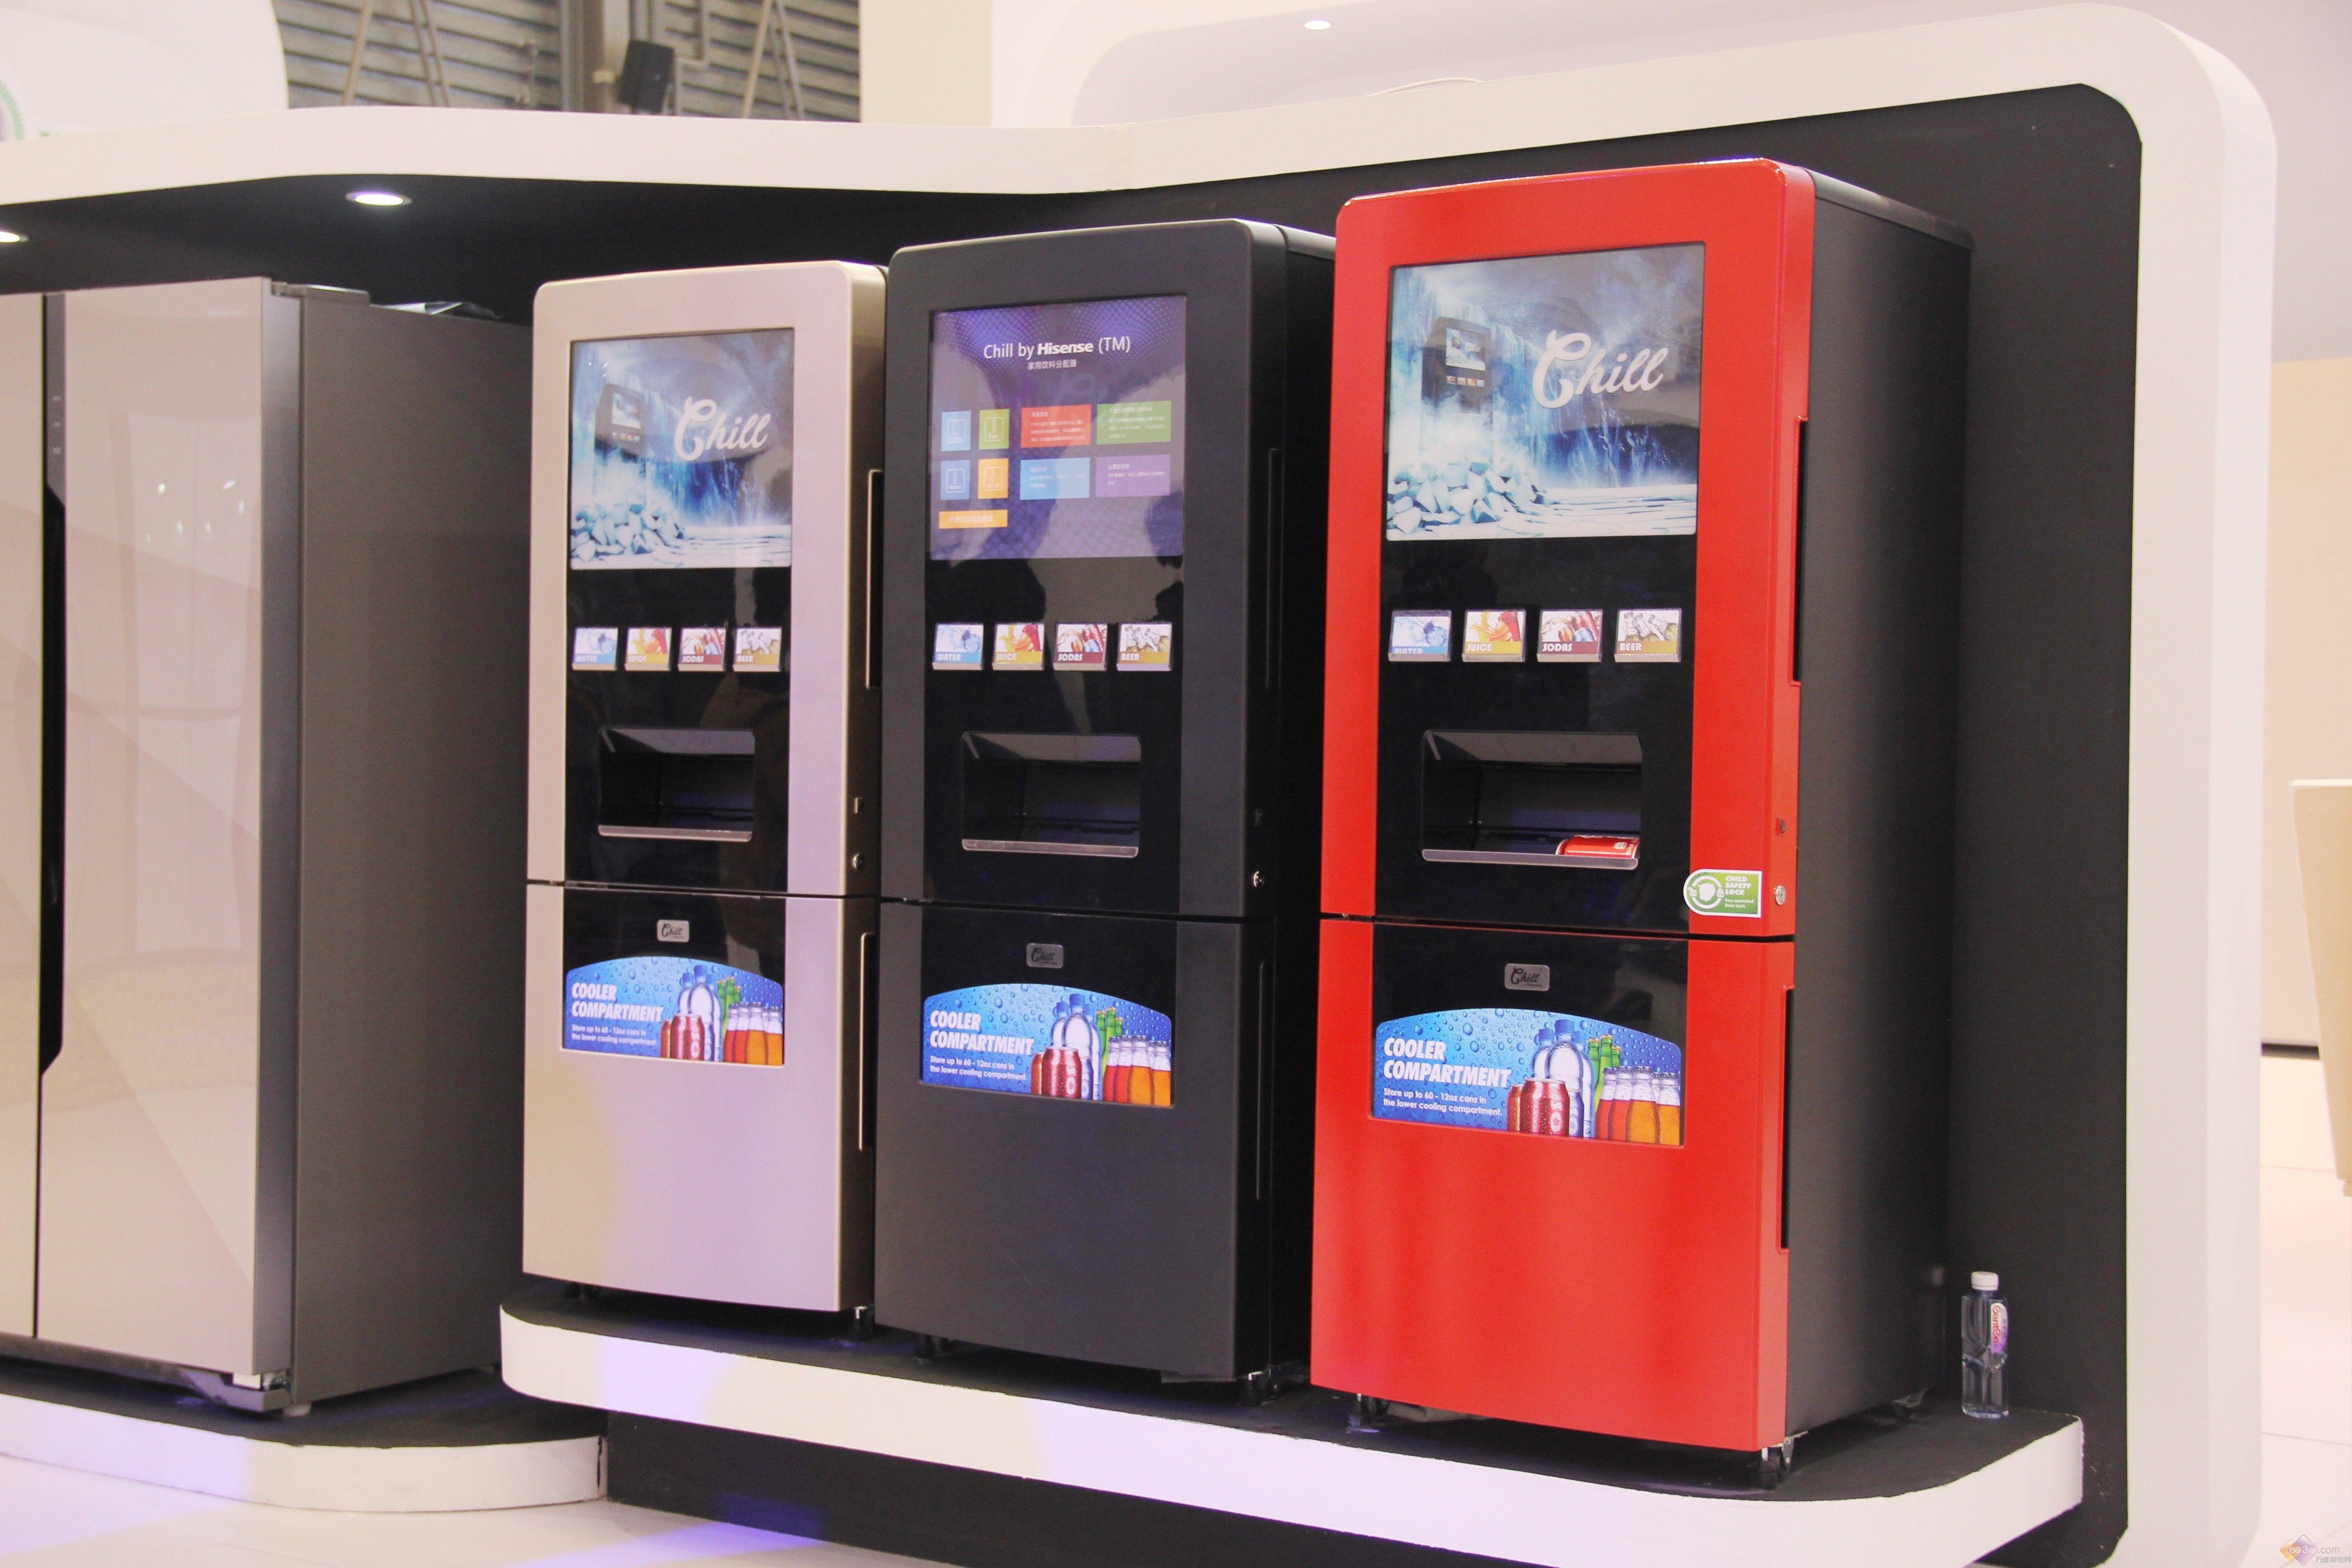 E評測:海信家庭飲料分配器隨時提供飲品